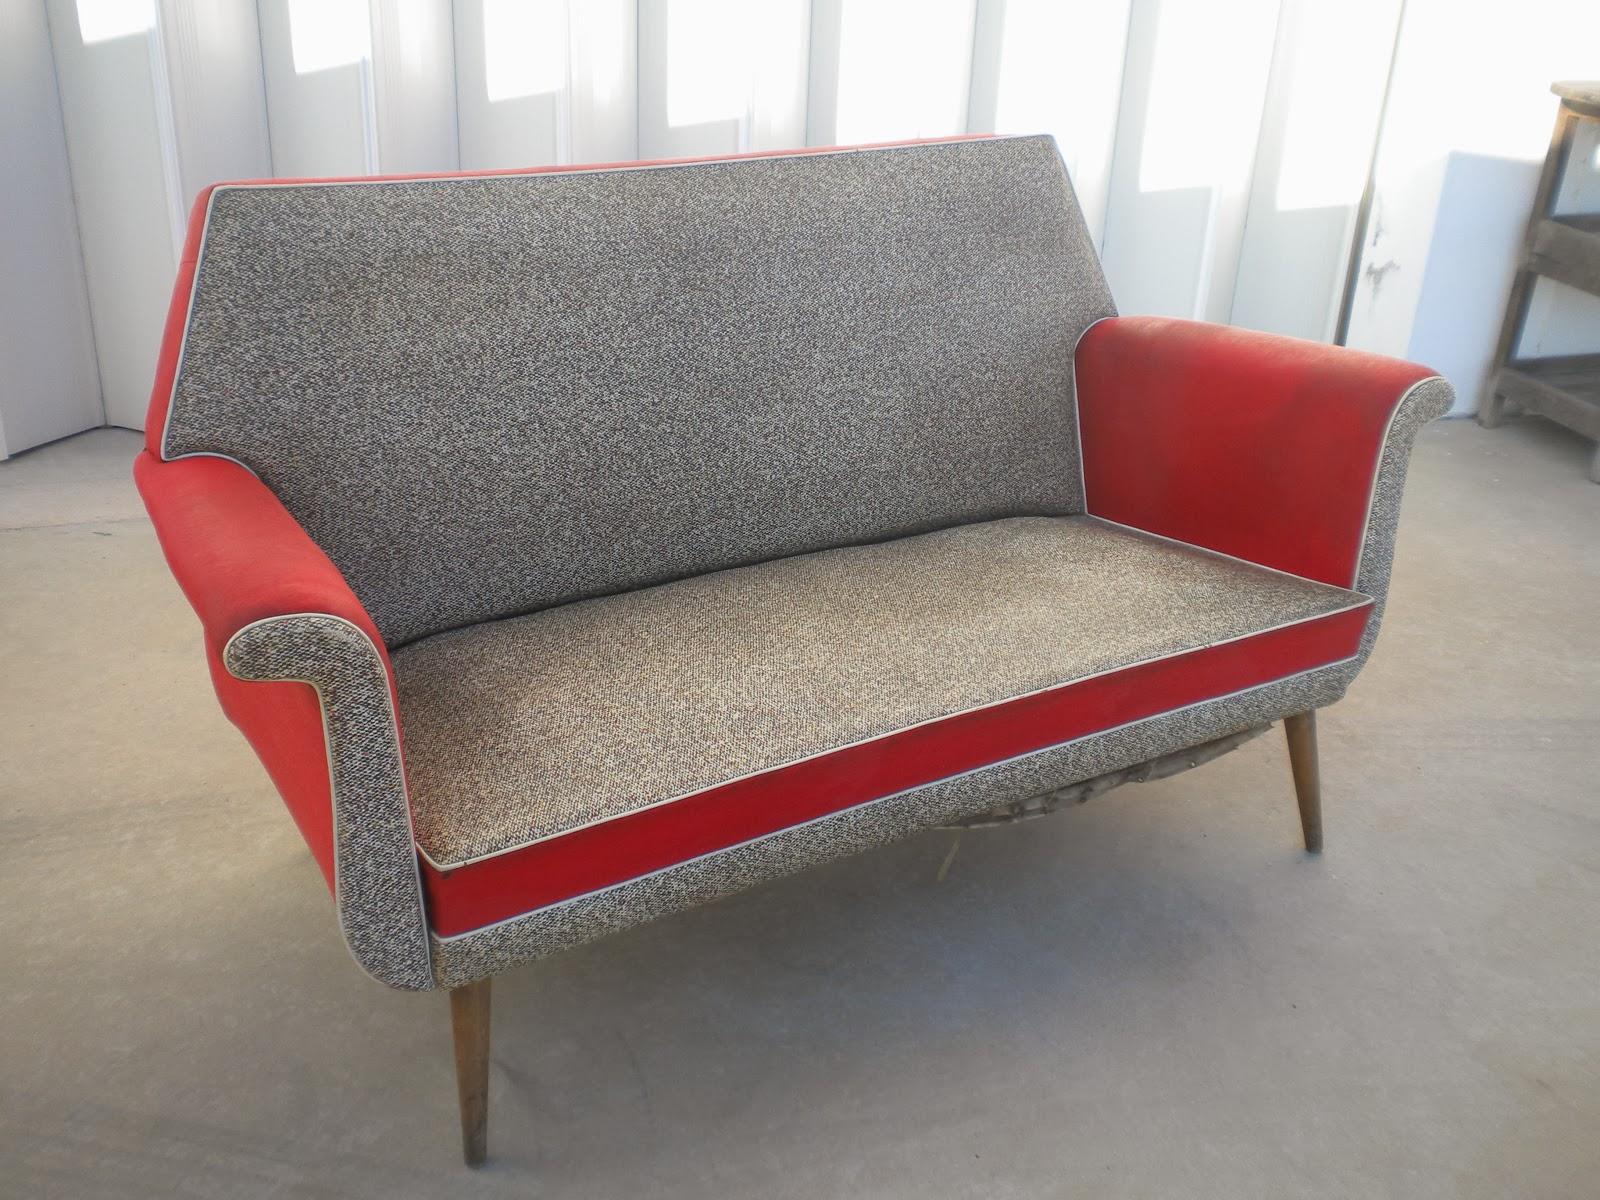 De vintage cadeir o sofa 3 lugares vintage napa for Mobiliario anos 50